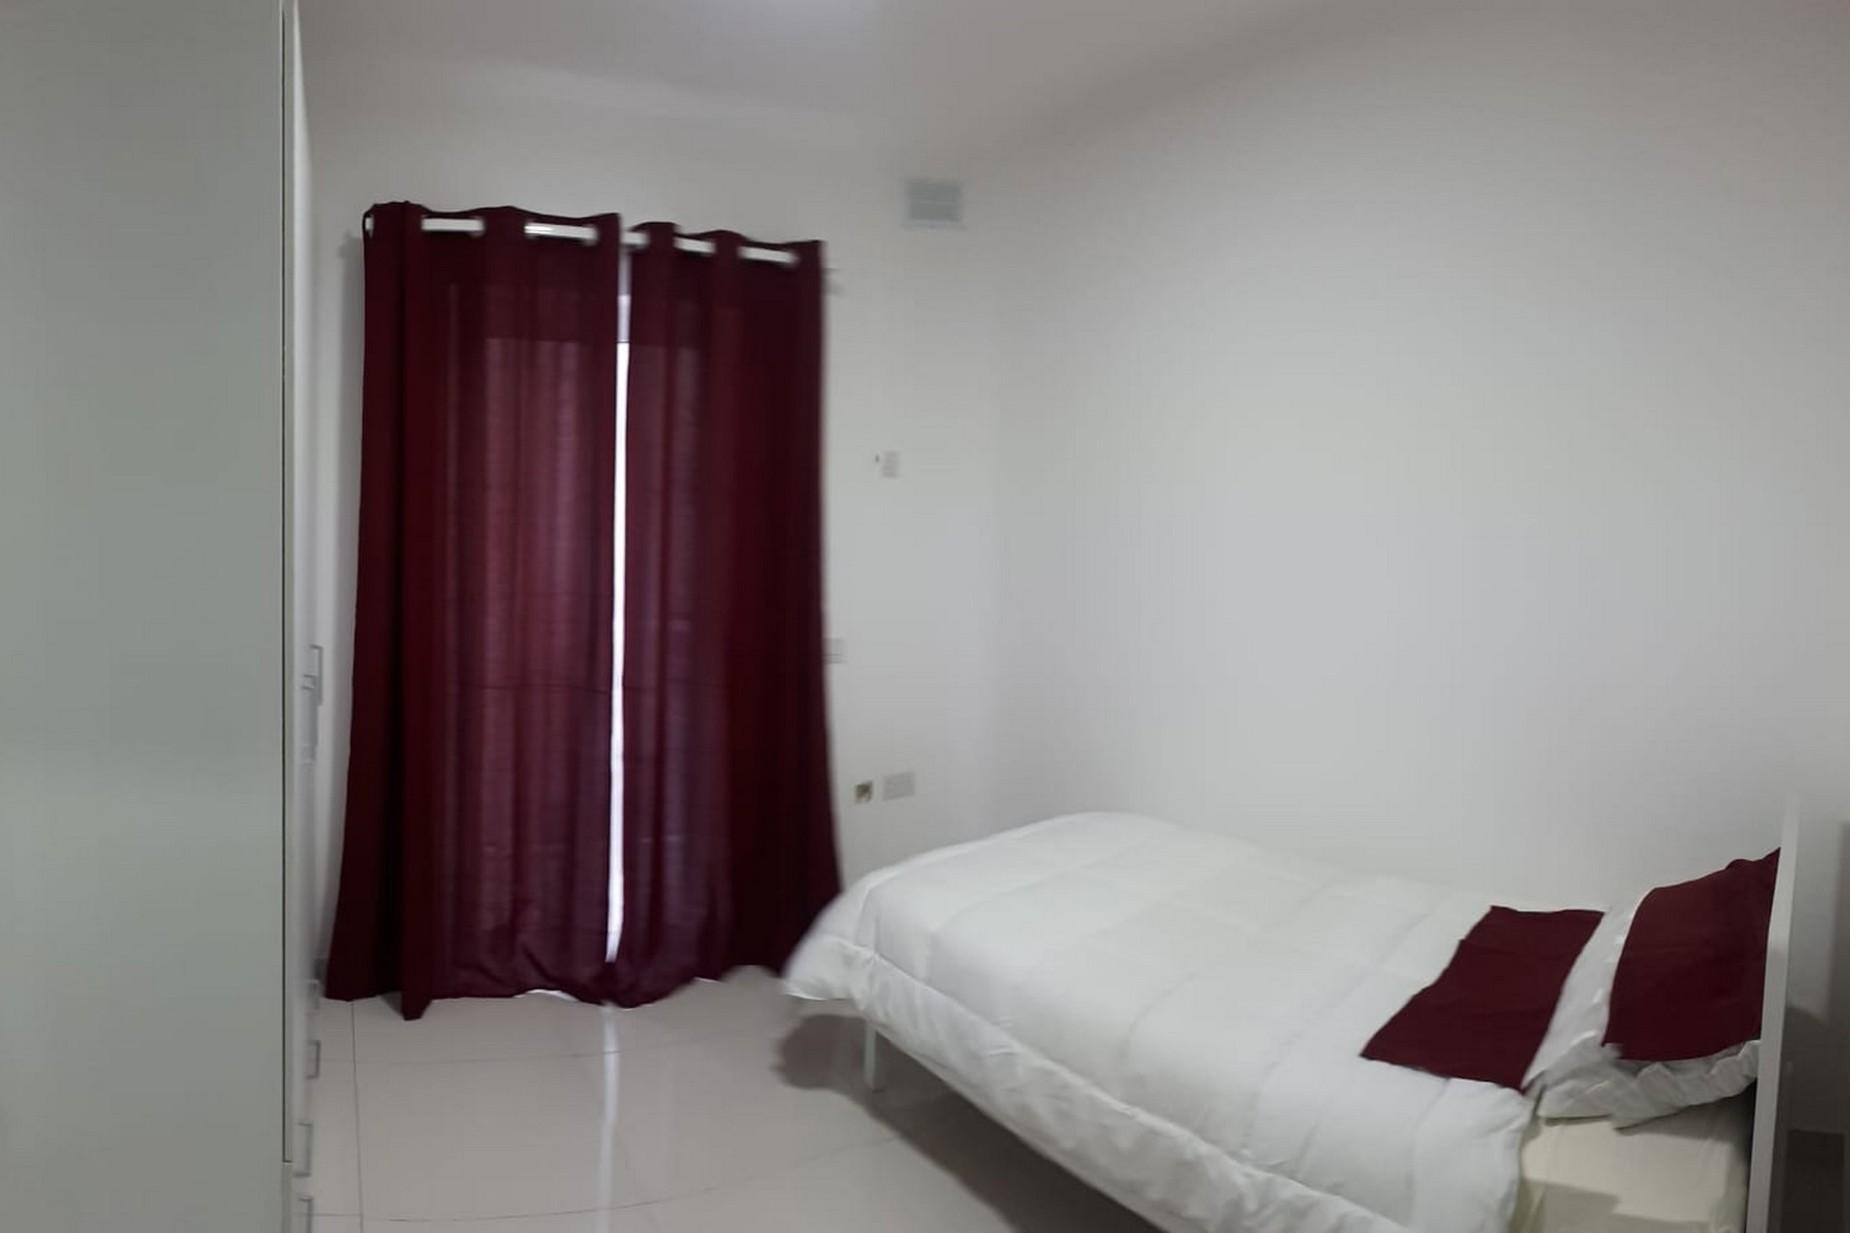 3 bed Apartment For Rent in Rabat, Rabat - thumb 7